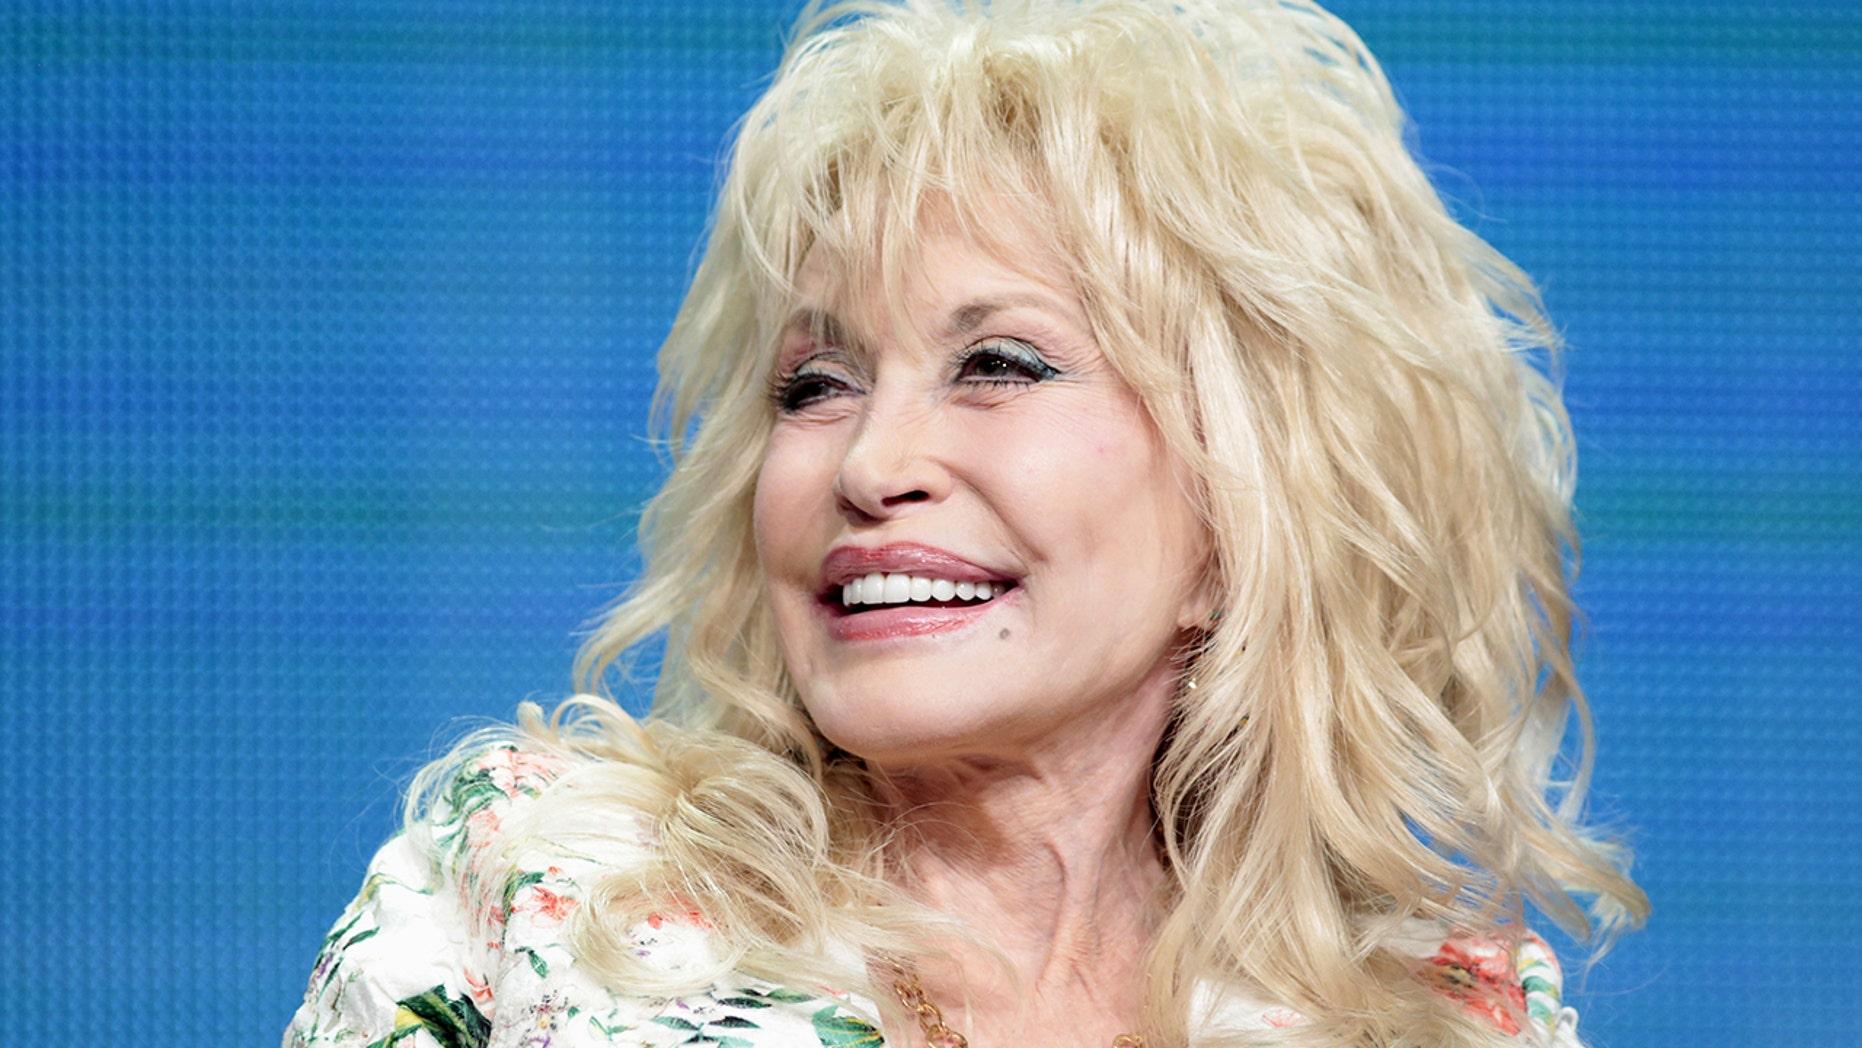 Dolly Parton's Dollywood amusement park won an award for having the best food.